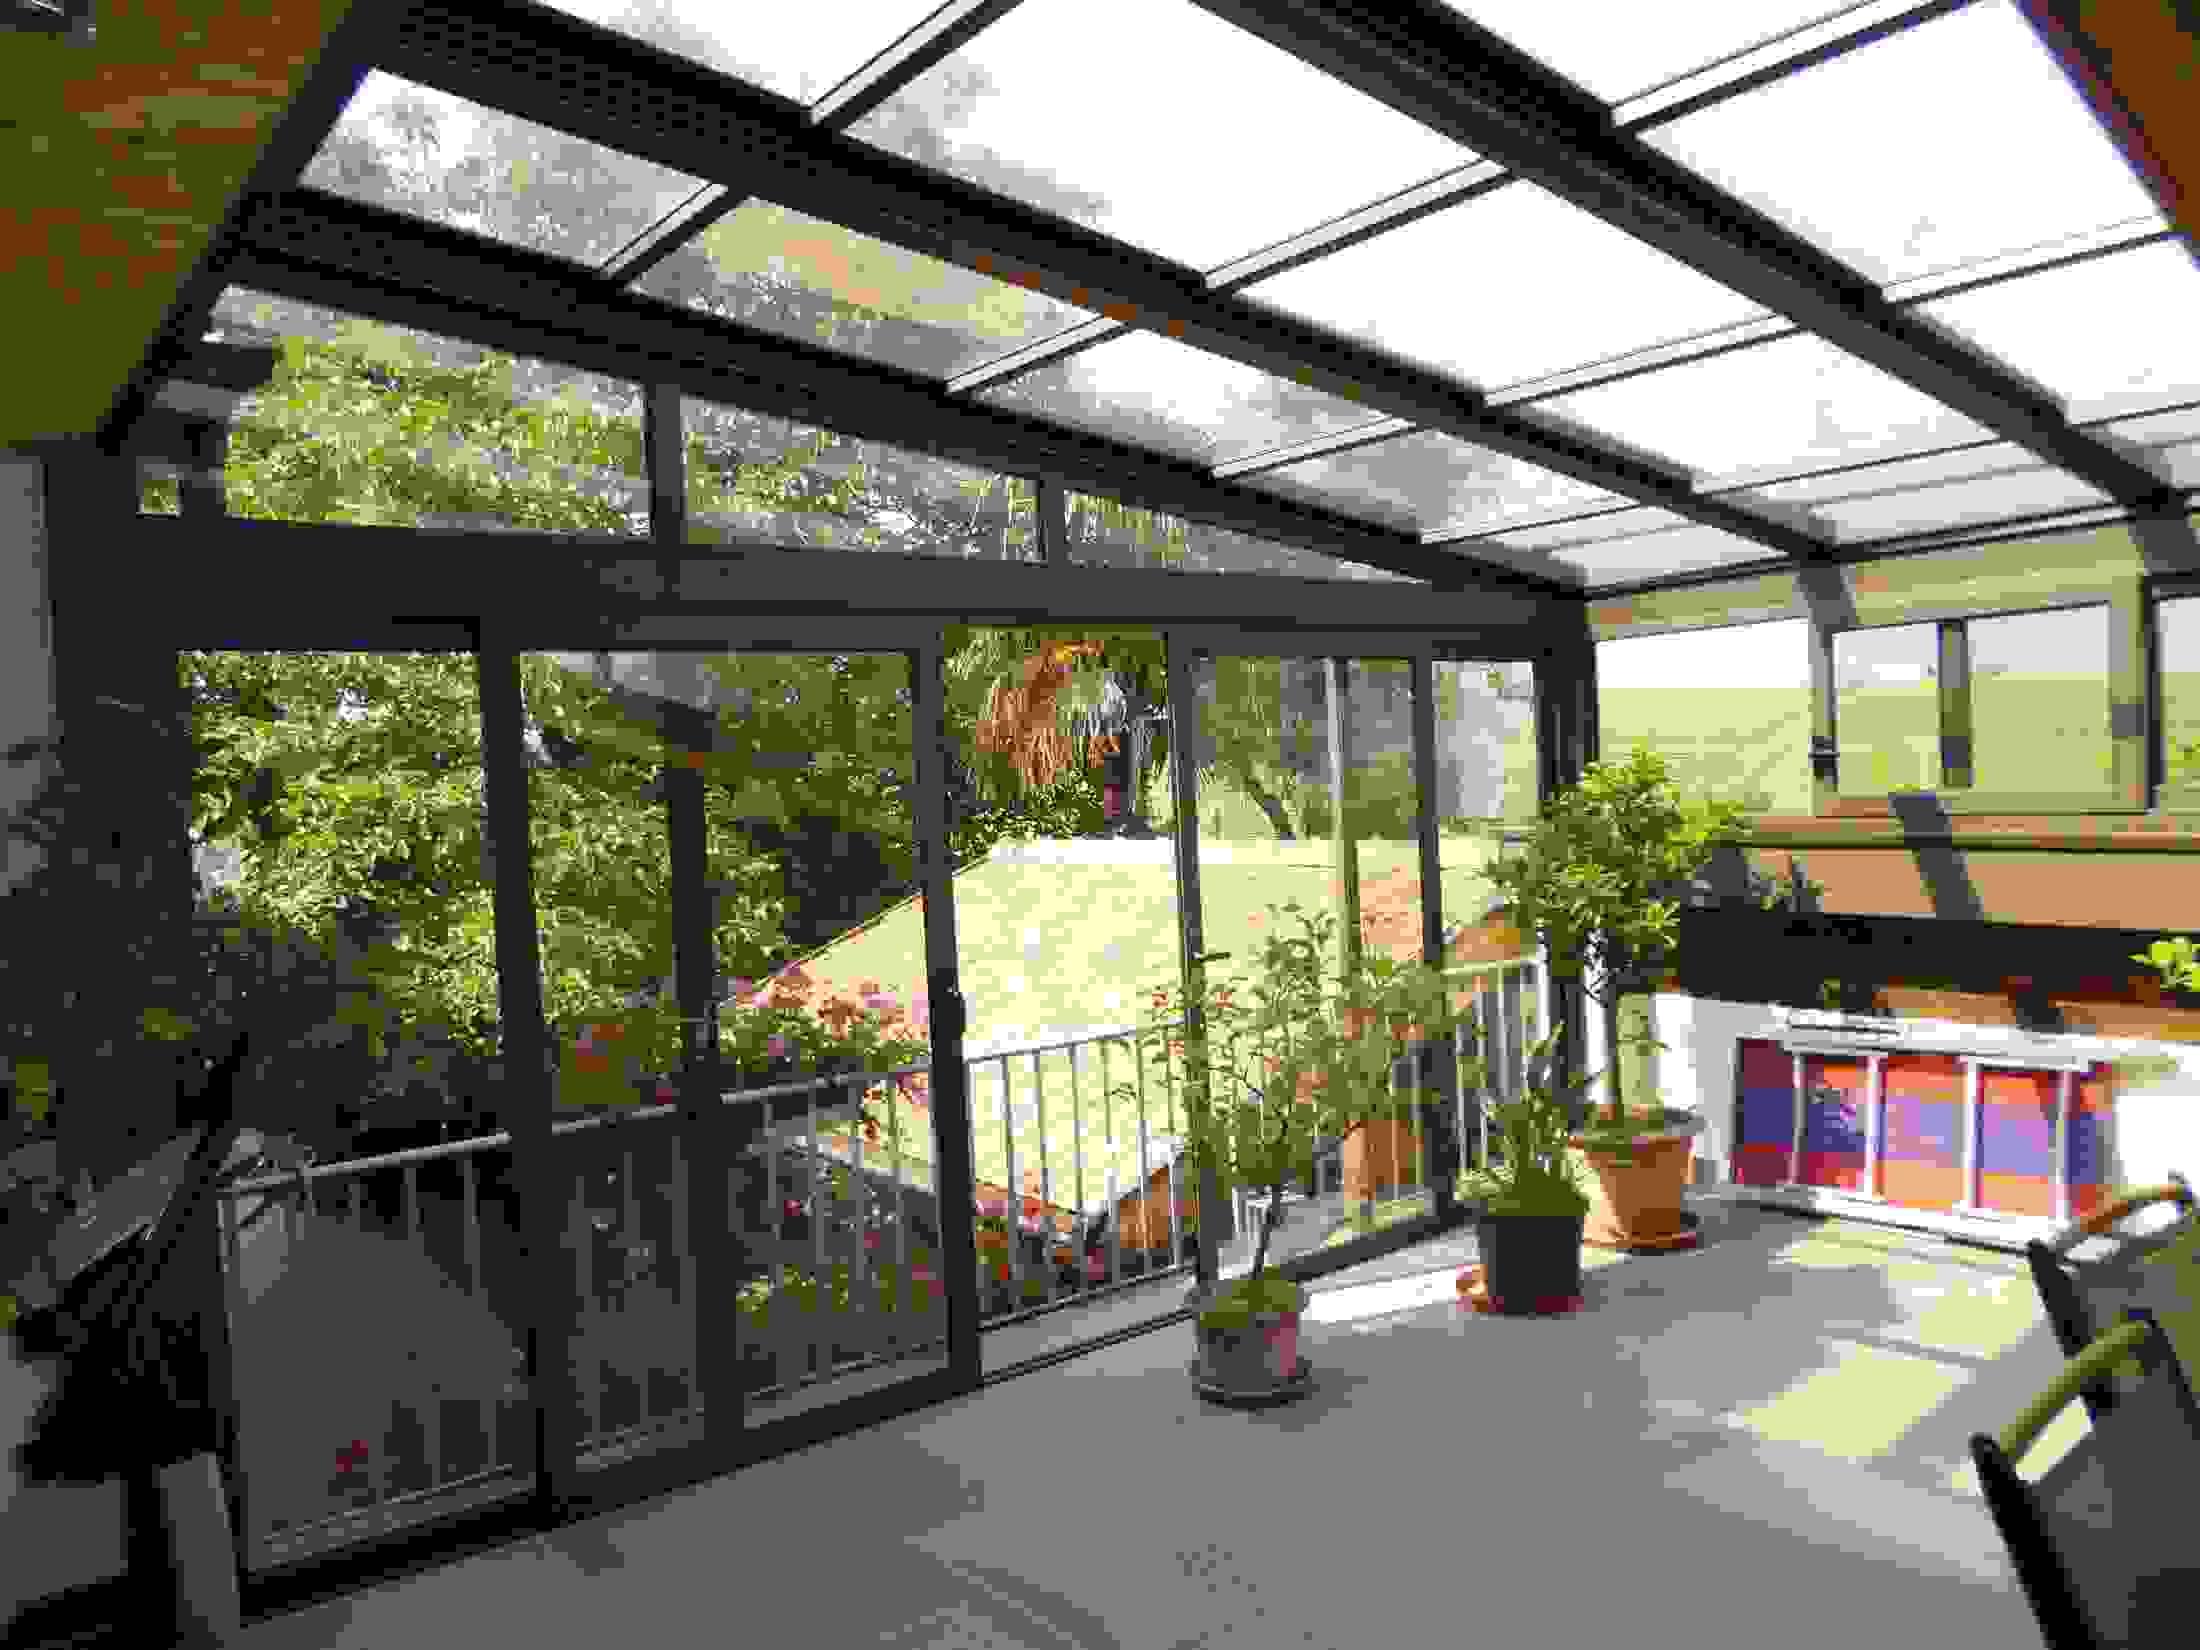 schiebewand e biasi markisen wintergarten. Black Bedroom Furniture Sets. Home Design Ideas